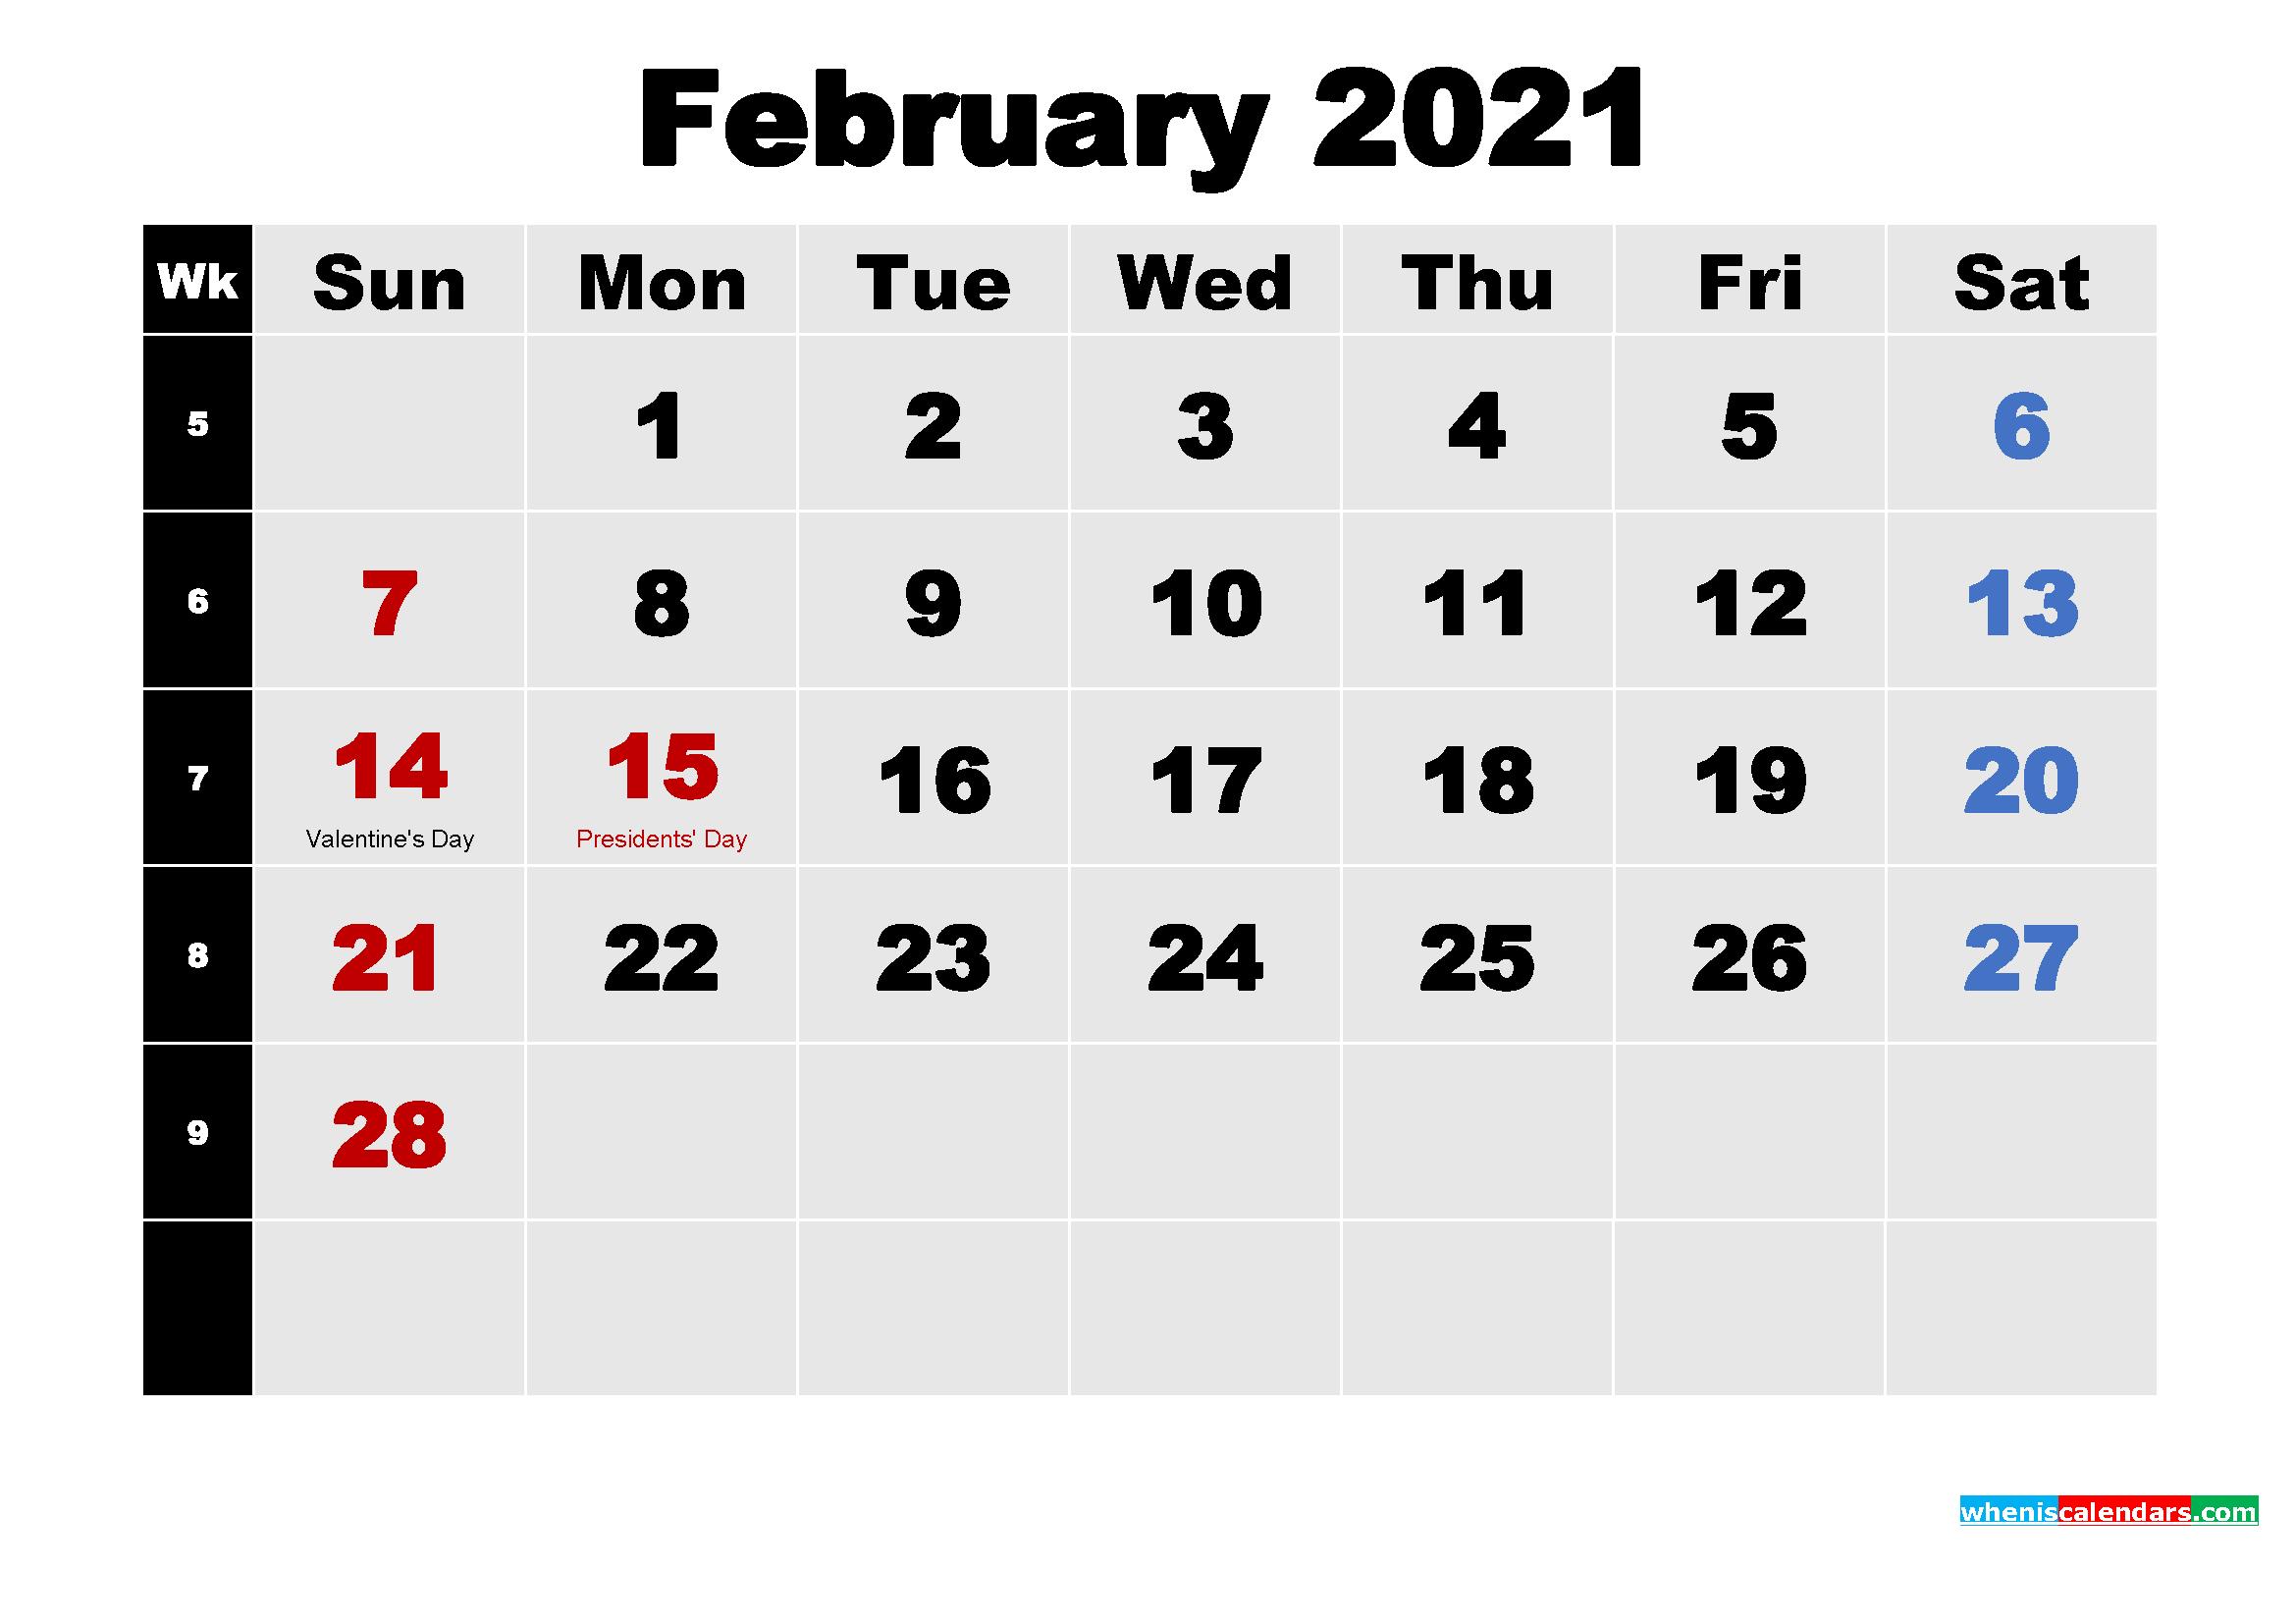 February 2021 Calendar with Holidays Wallpaper